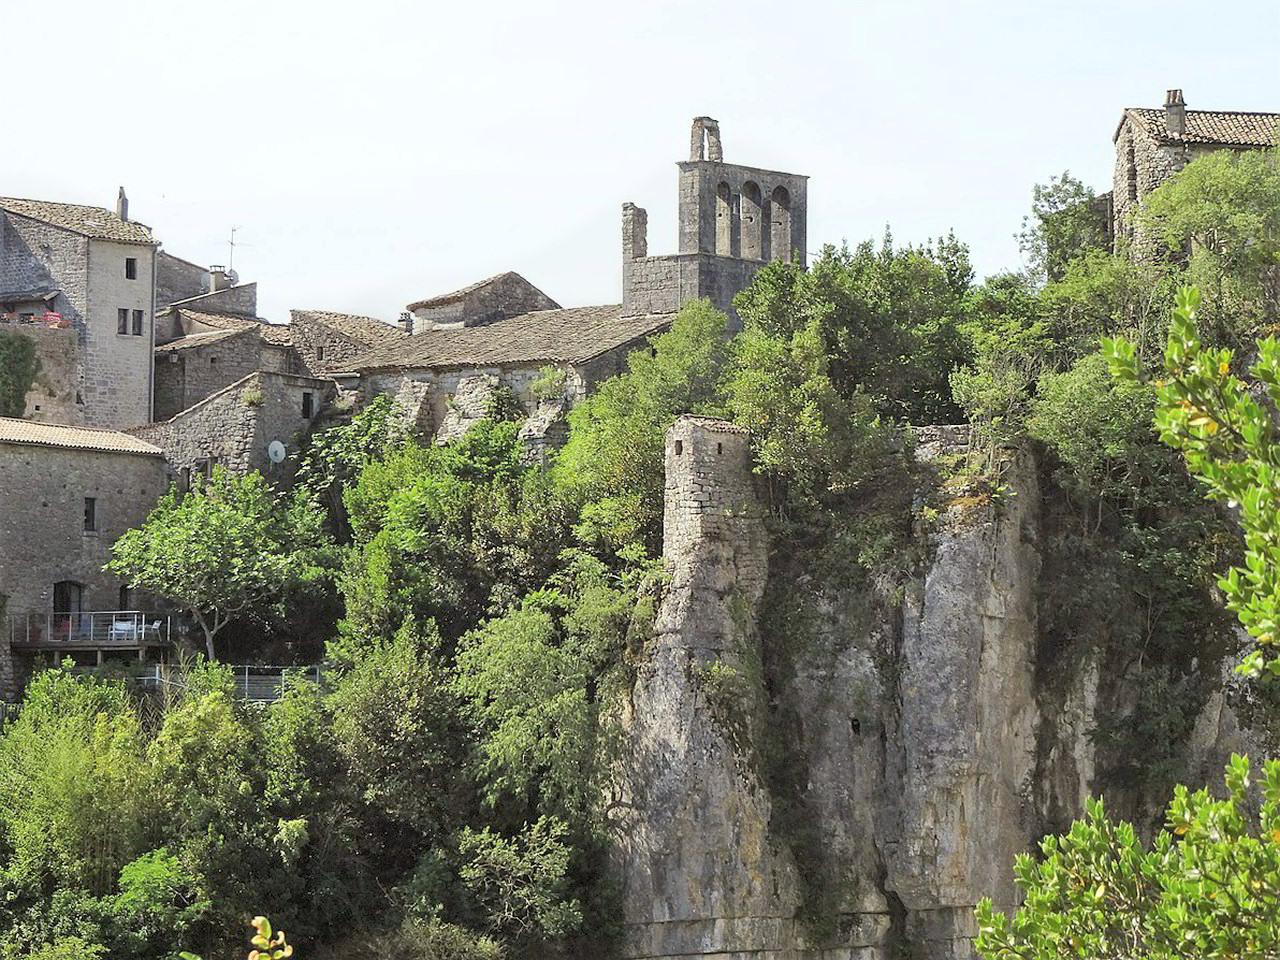 Eglise Notre-Dame de Balazuc